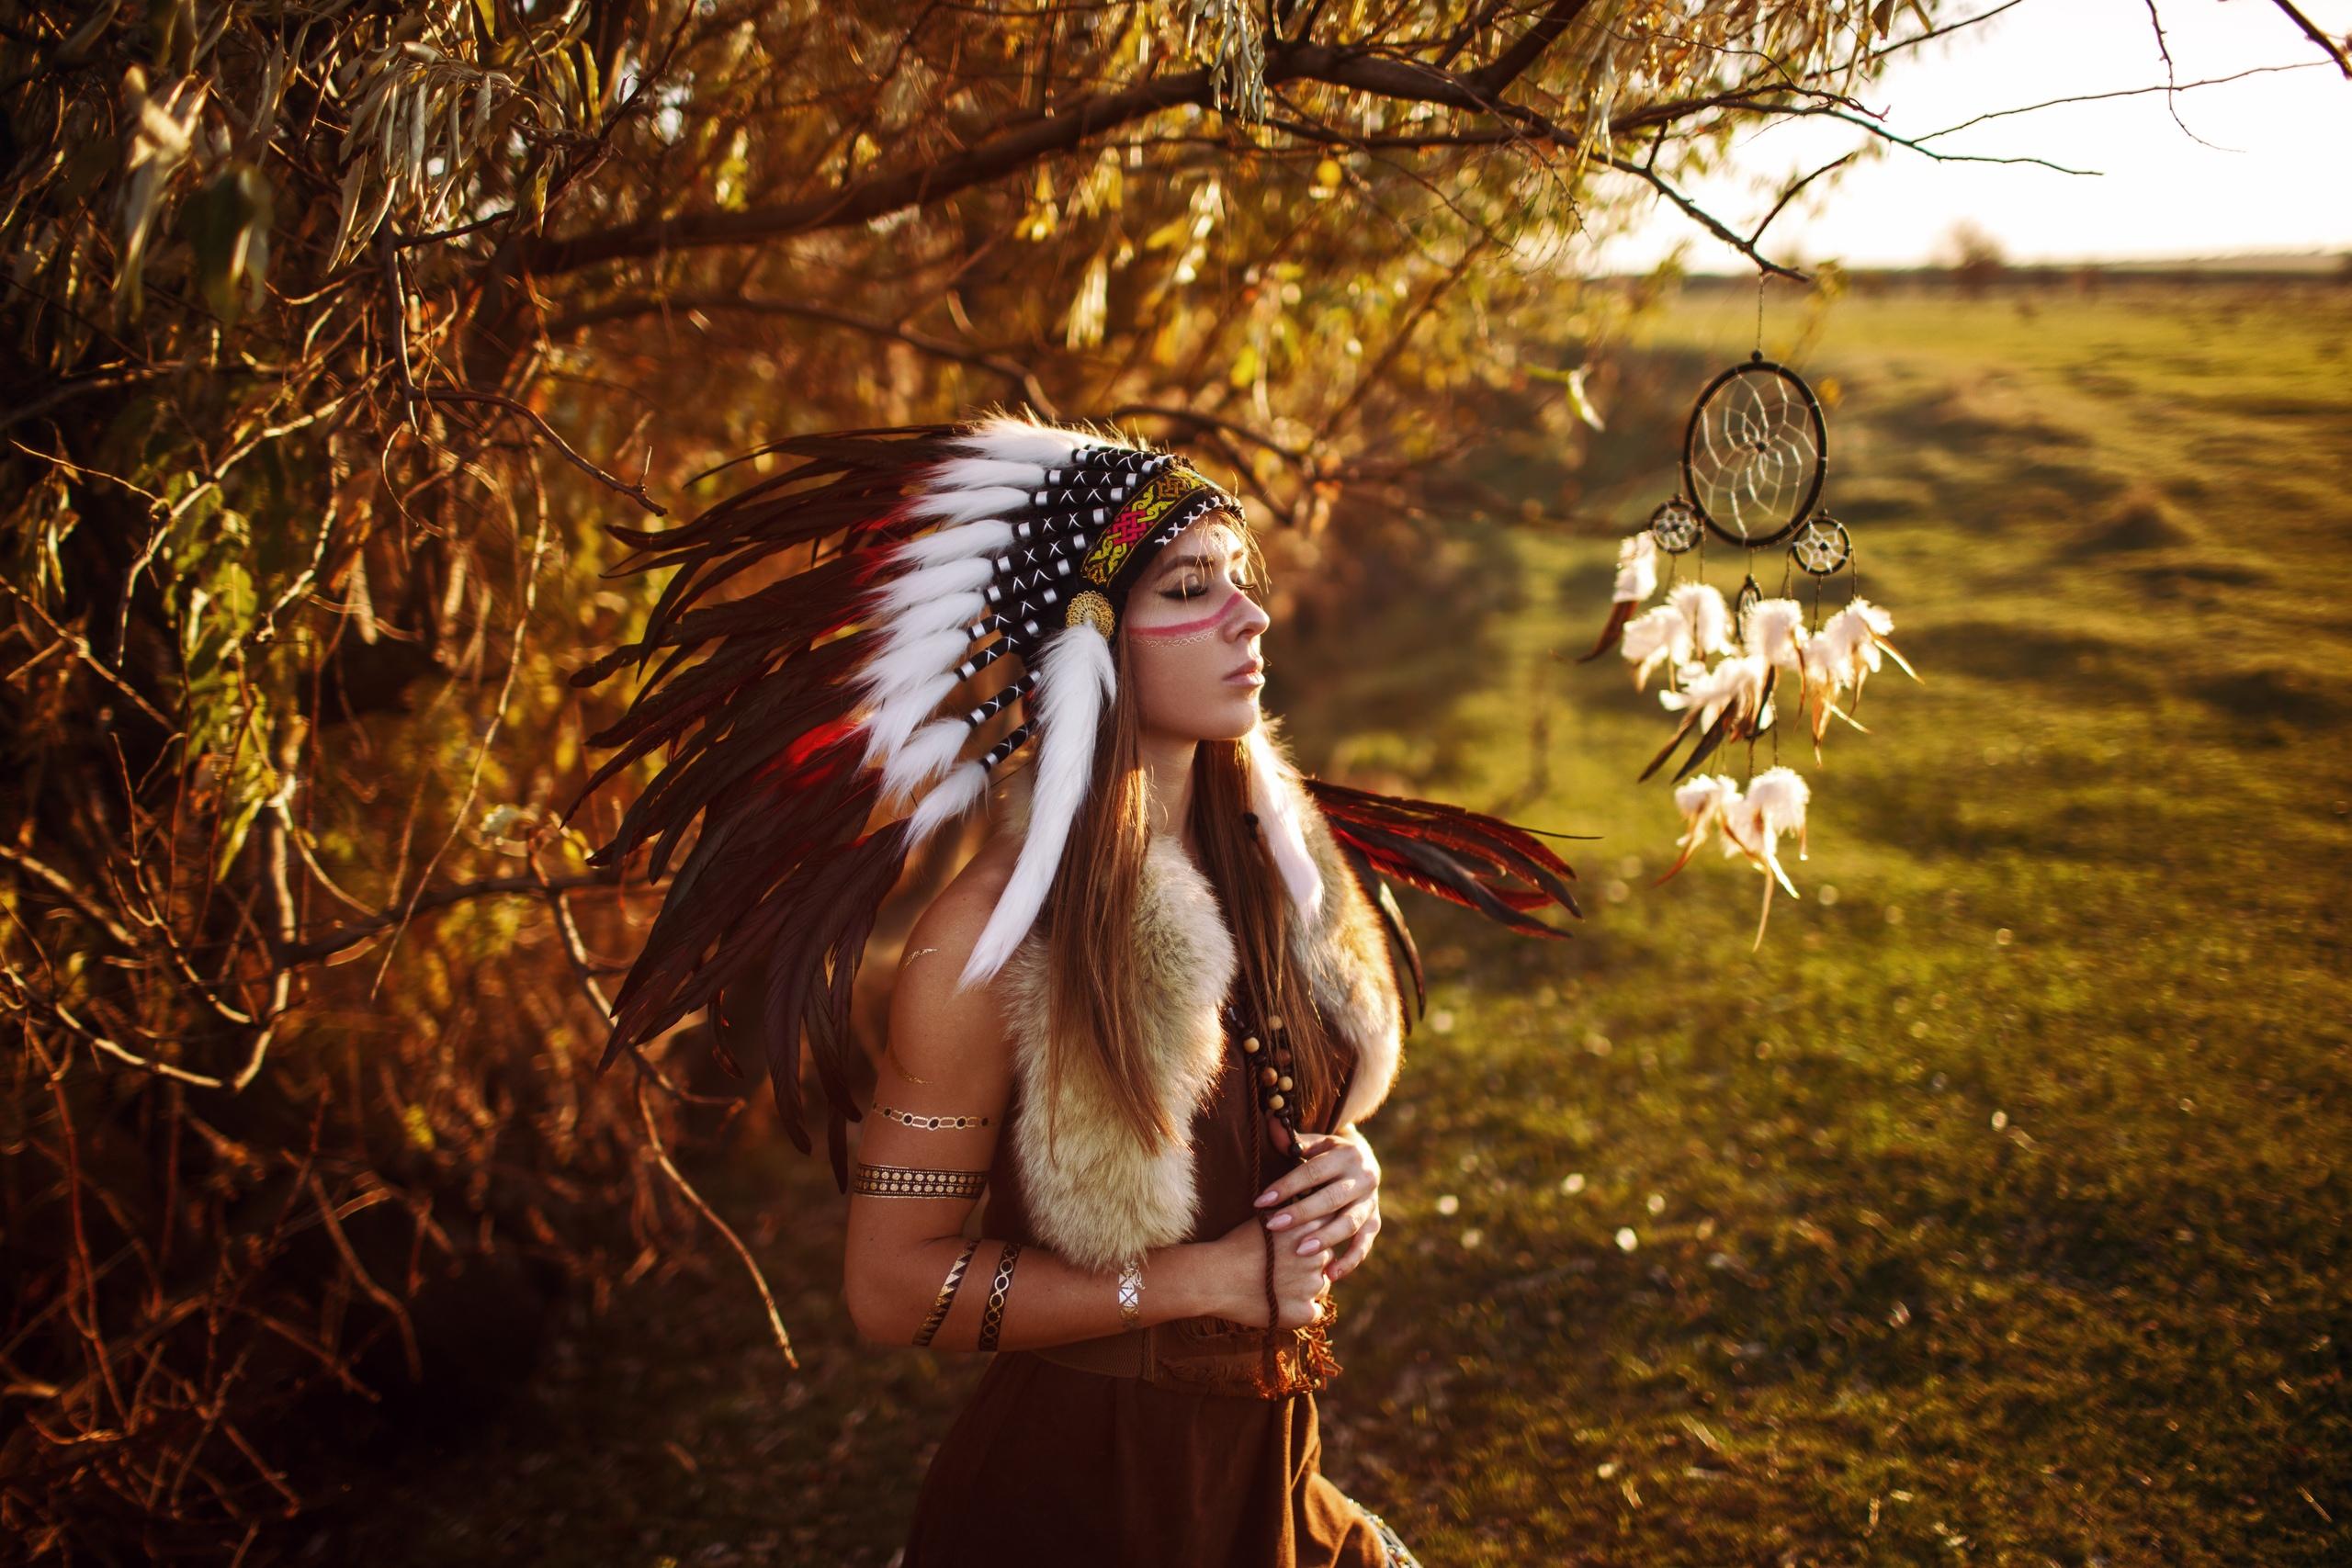 Dreamcatcher Feather Girl Headband Model Native American Redhead Woman 2560x1707